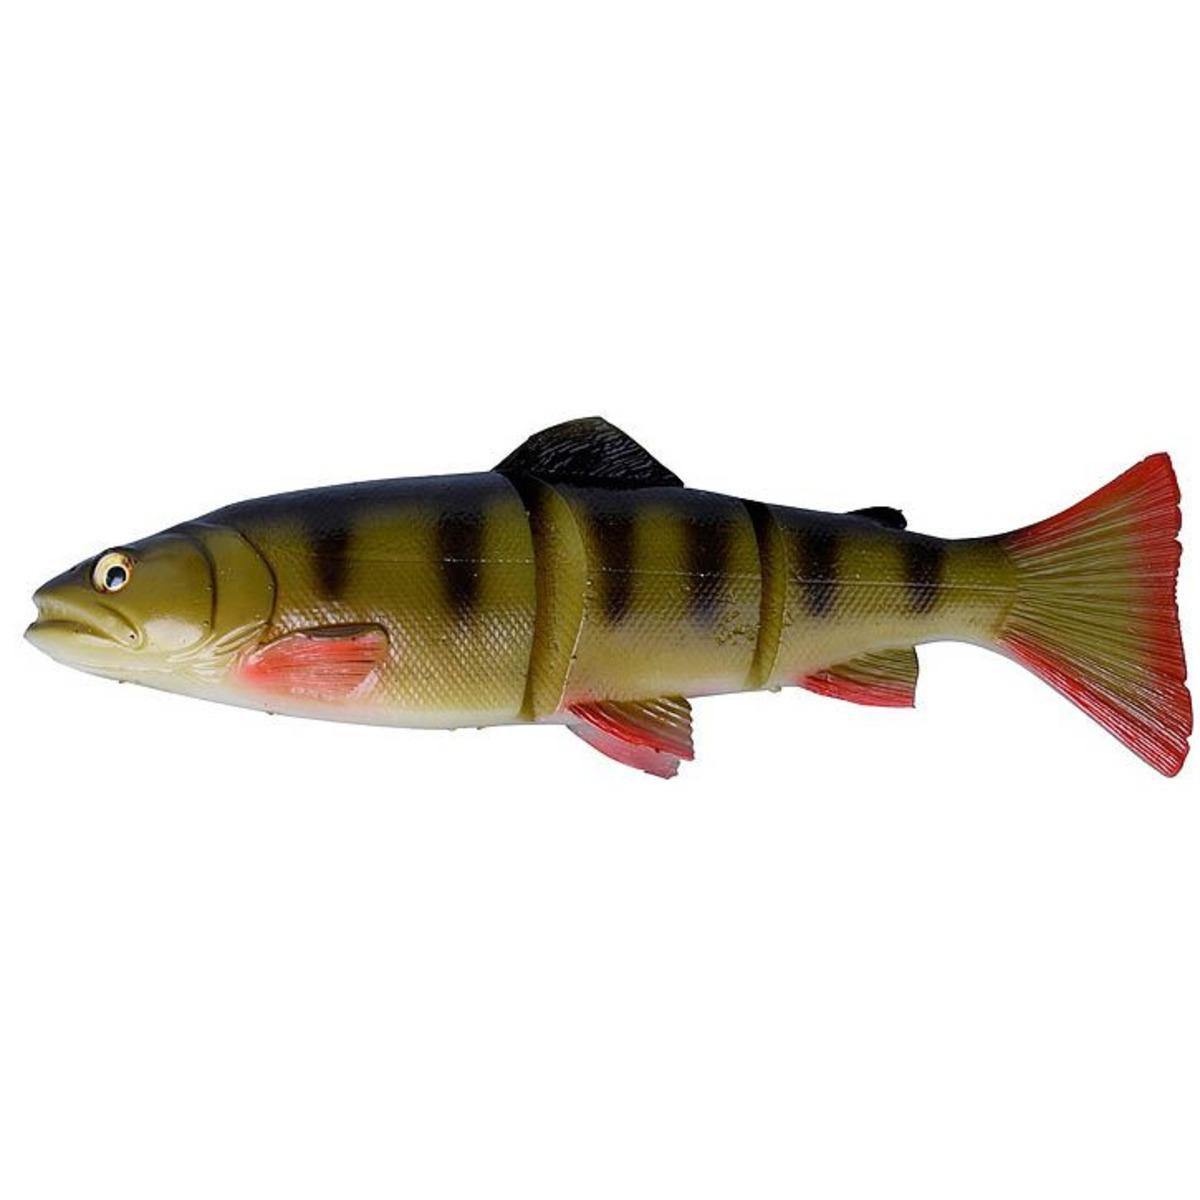 Savage Gear 3D Trout Line Thru - 25 cm - 193 g - Perch